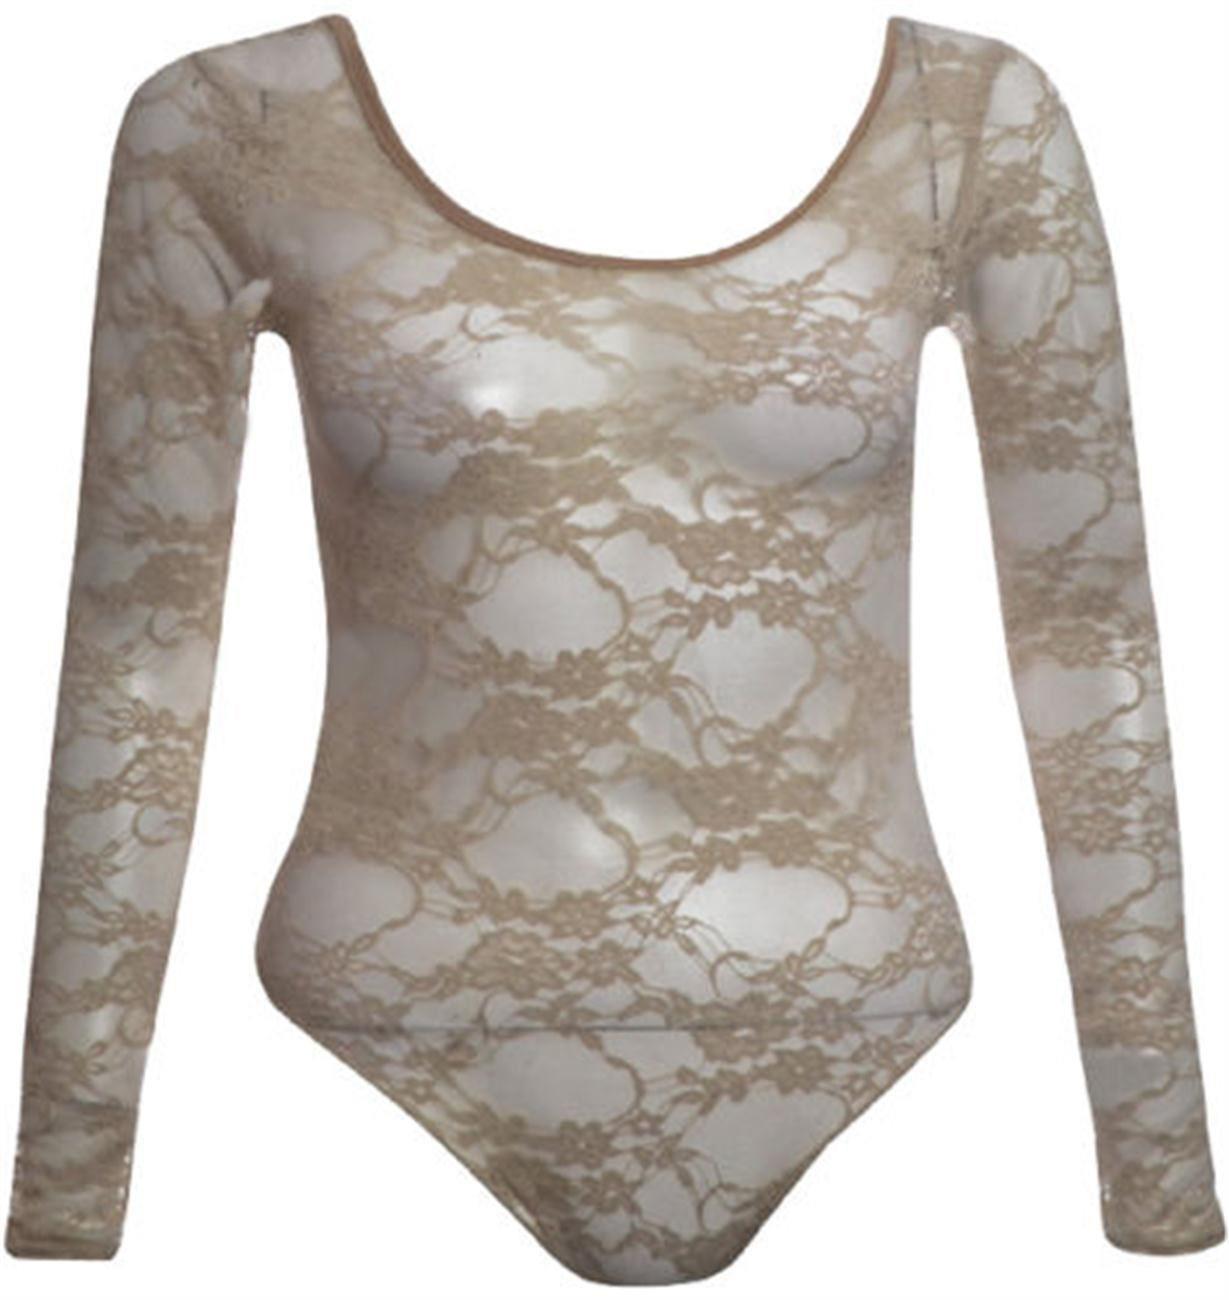 0a292b842ae TAYA Plus Size Floral Lace Bodysuits Tops 16-24 - Plus Sizes